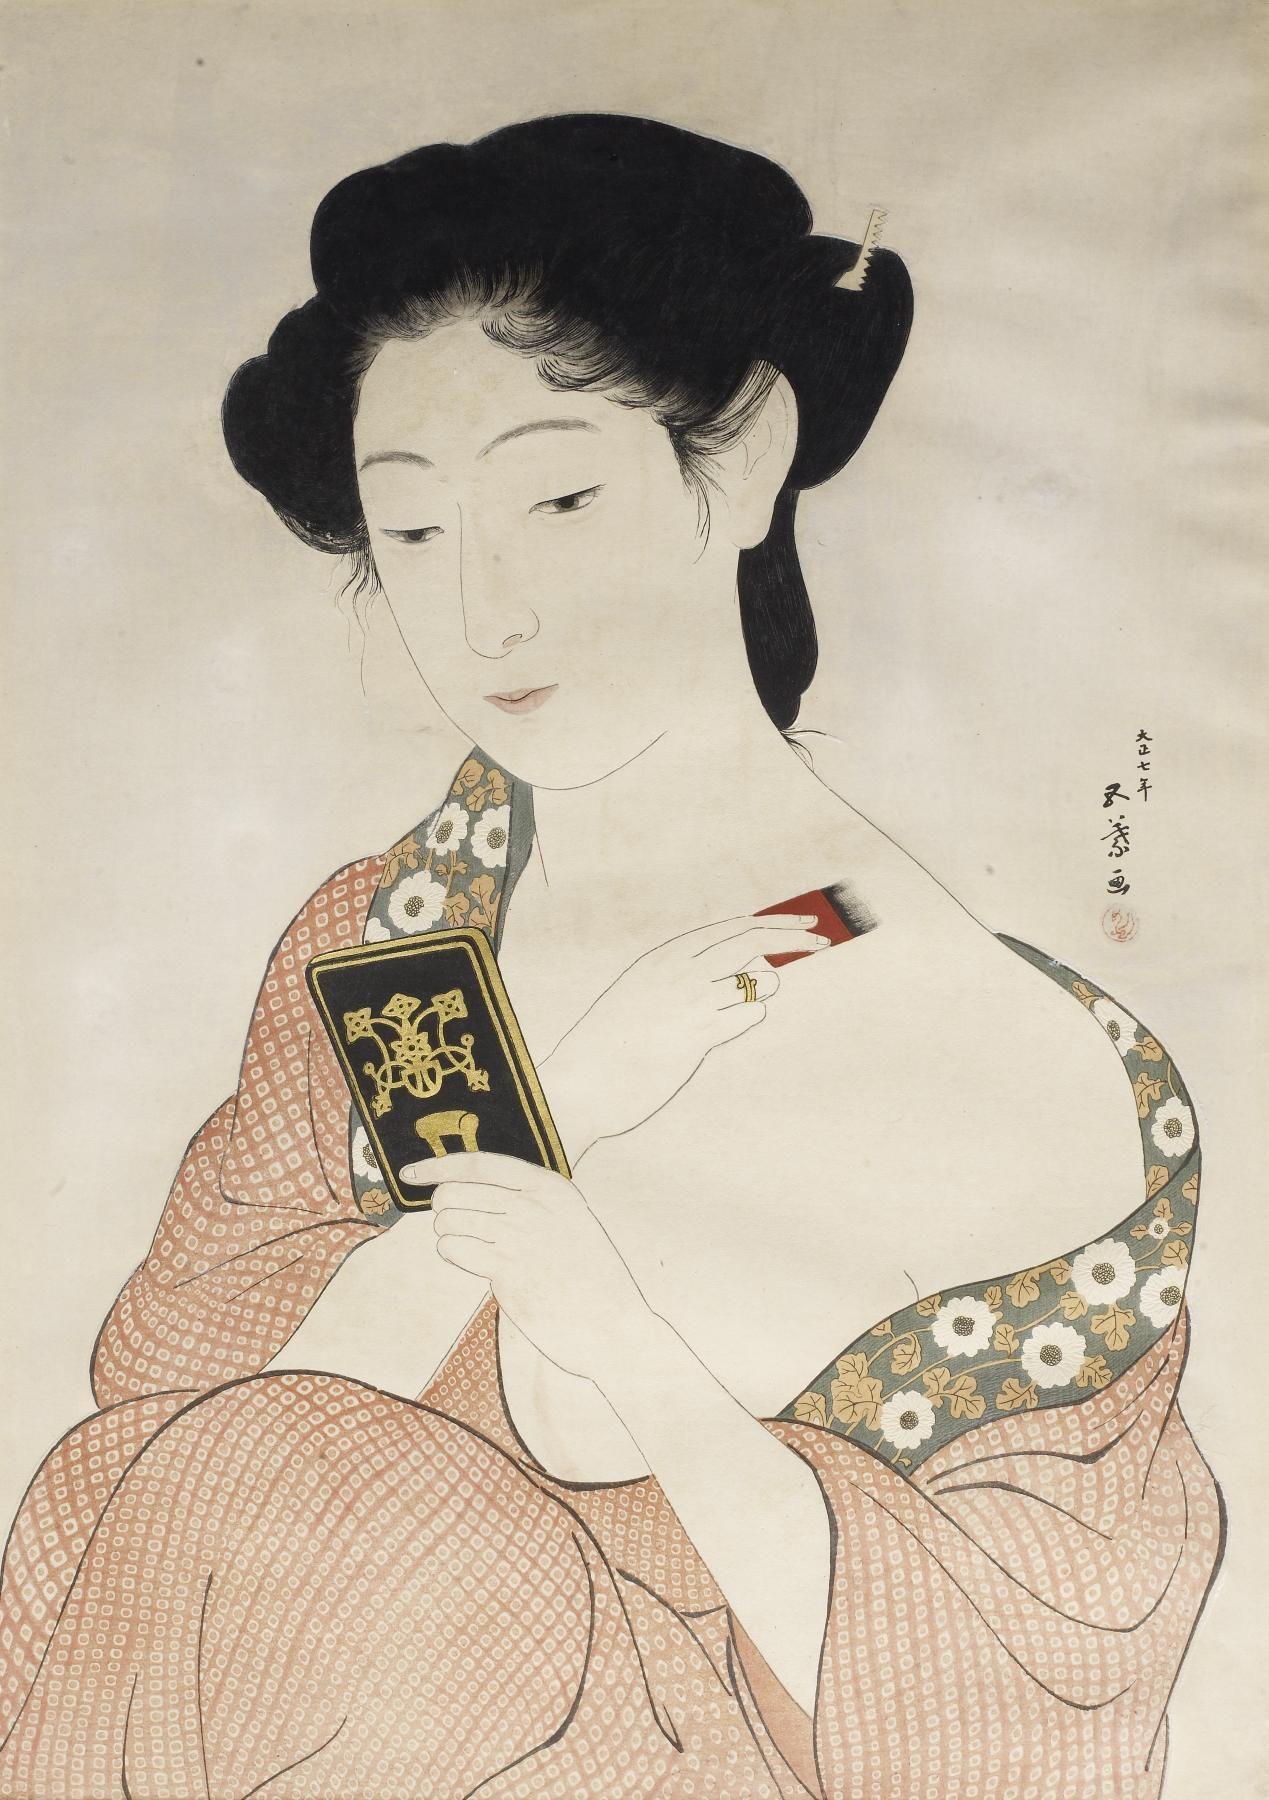 отметить, гравюры кореянки рисунки картинки тамбура нужно